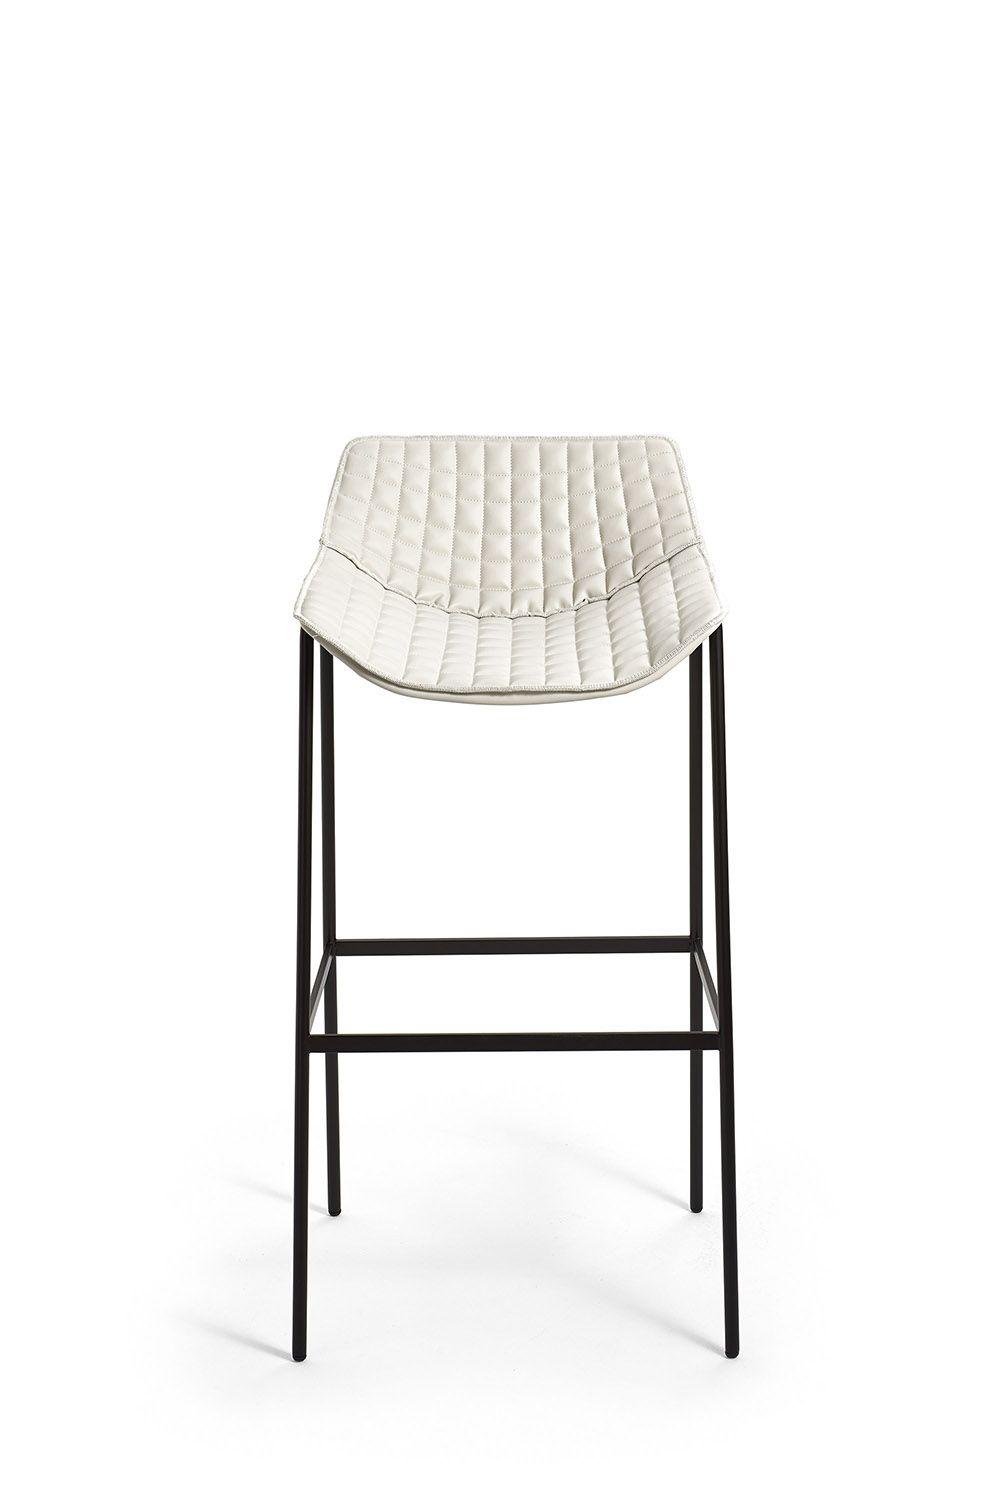 steel chair accessories swivel tesco stool in grille summerset stools ottomans varaschin design furniture outdoordesign outdoordecor